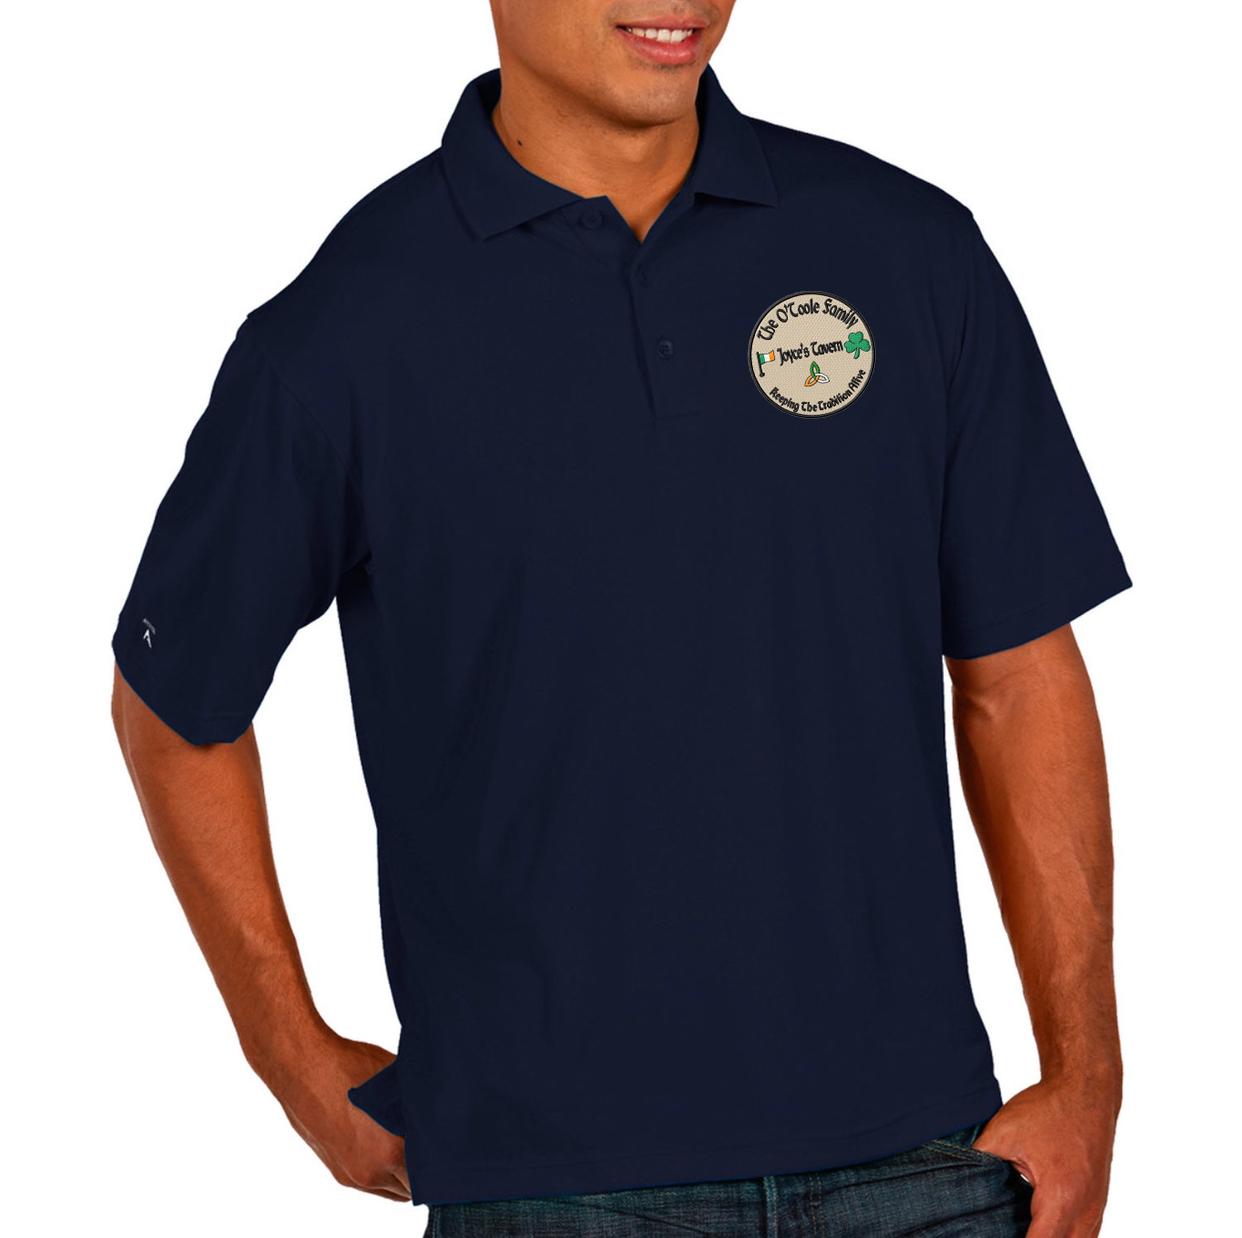 Blue and White Baseball Uniforms, T-Shirts